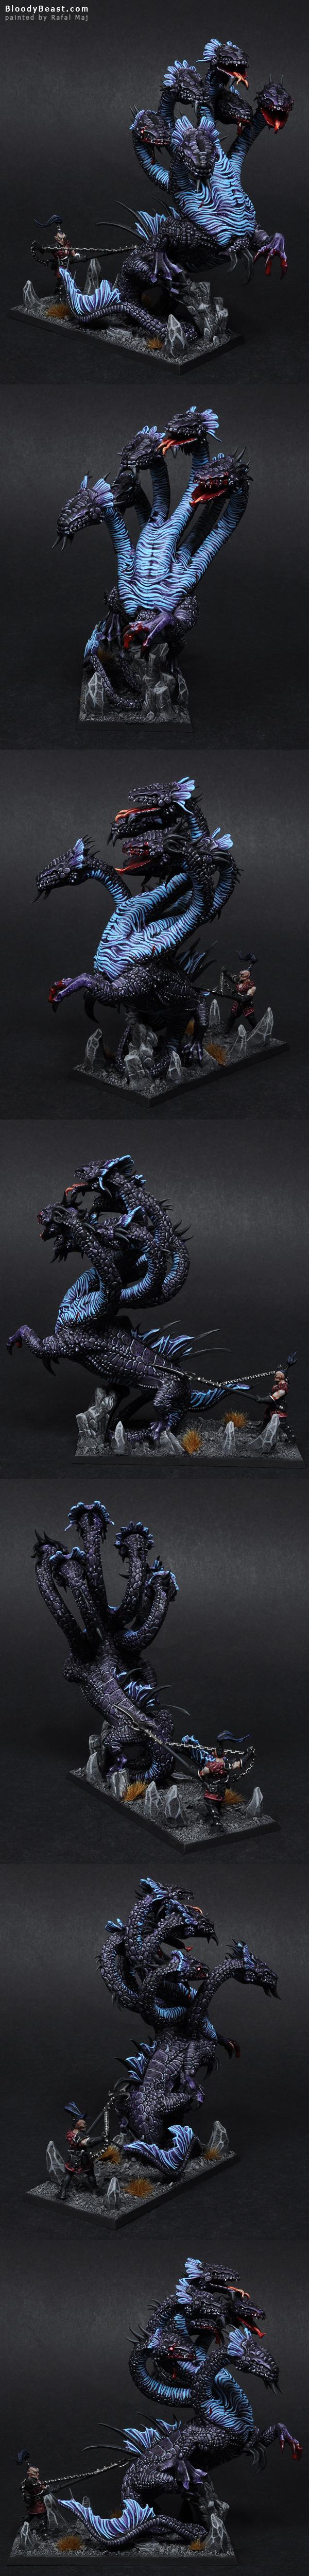 Dark Elves War Hydra painted by Rafal Maj (BloodyBeast.com)